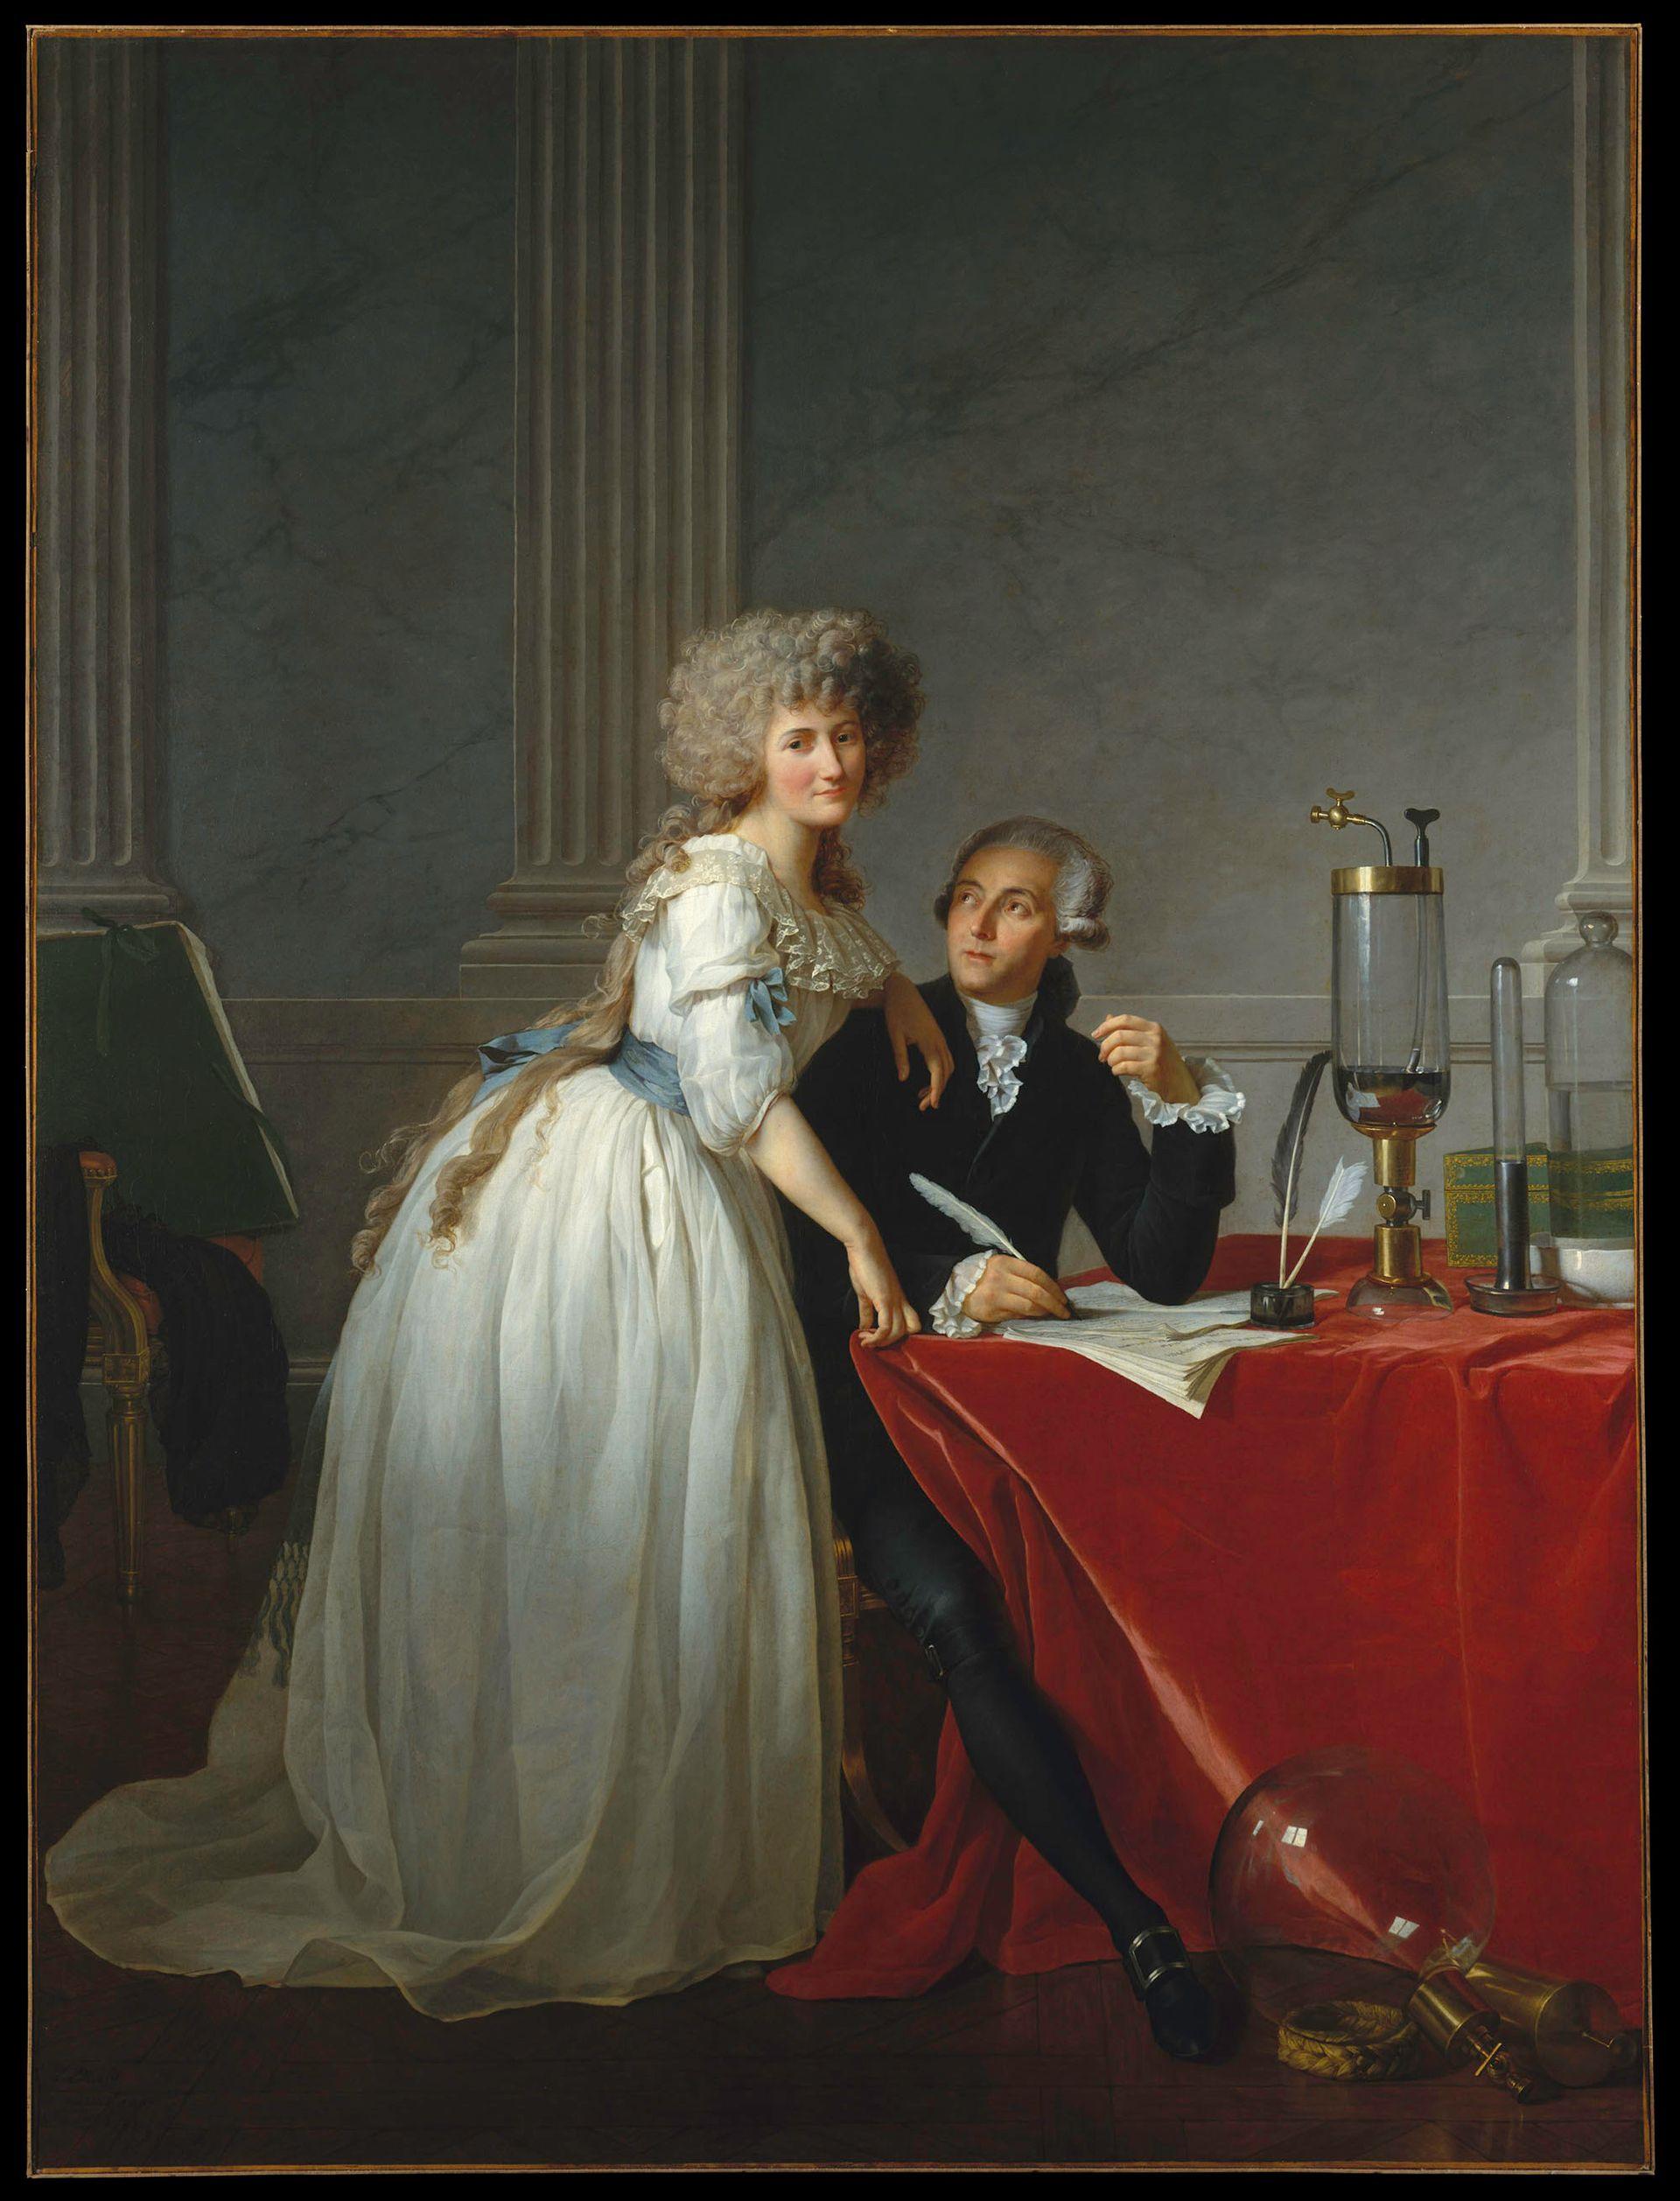 Jacques-Louis David's 1788 painting Antoine Laurent Lavoisier (1743-1794) and Marie Anne Lavoisier (1758-1836), at the Metropolitan Museum of Art Metropolitan Museum of Art